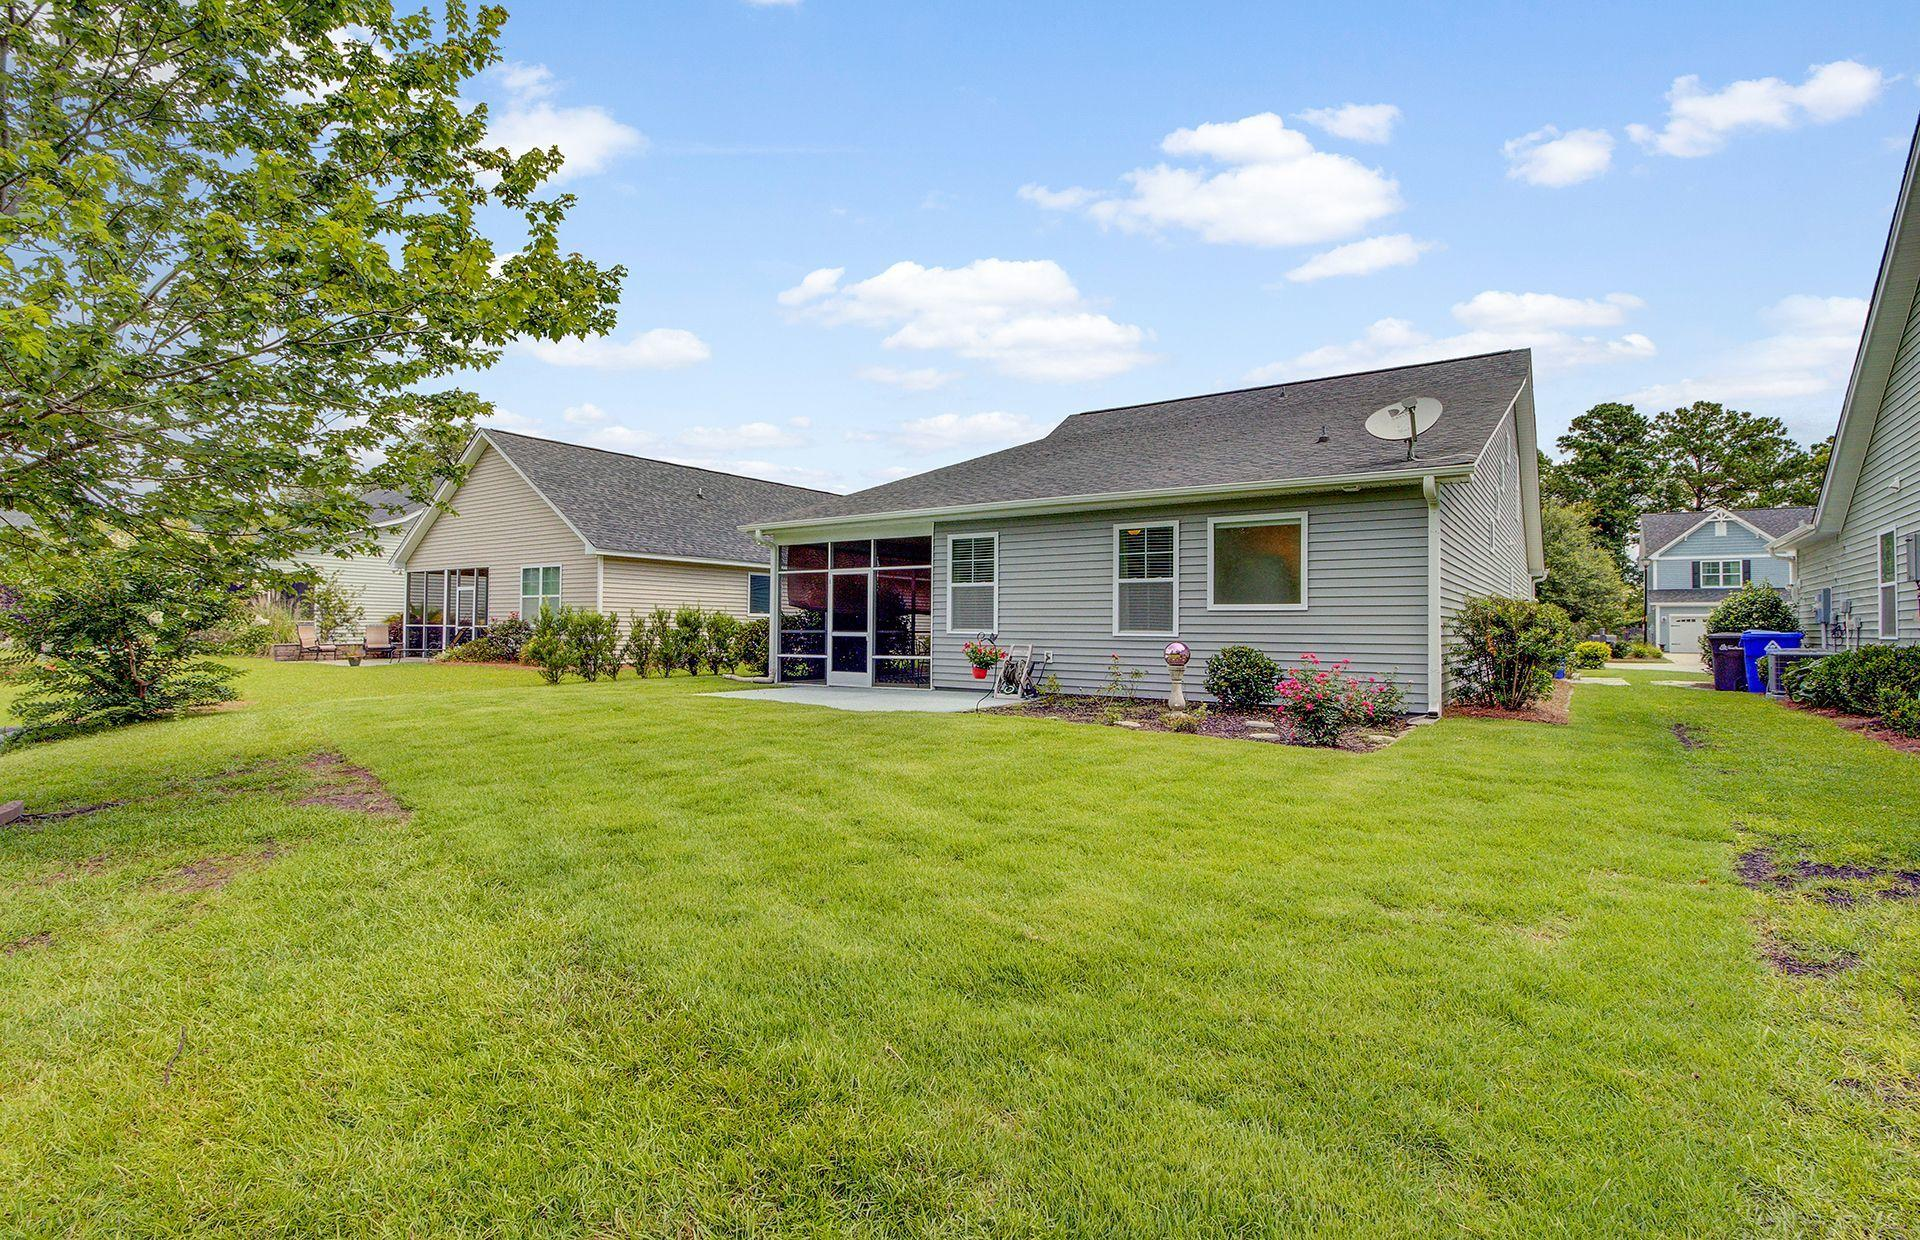 Linnen Place Homes For Sale - 1275 Shingleback, Mount Pleasant, SC - 4